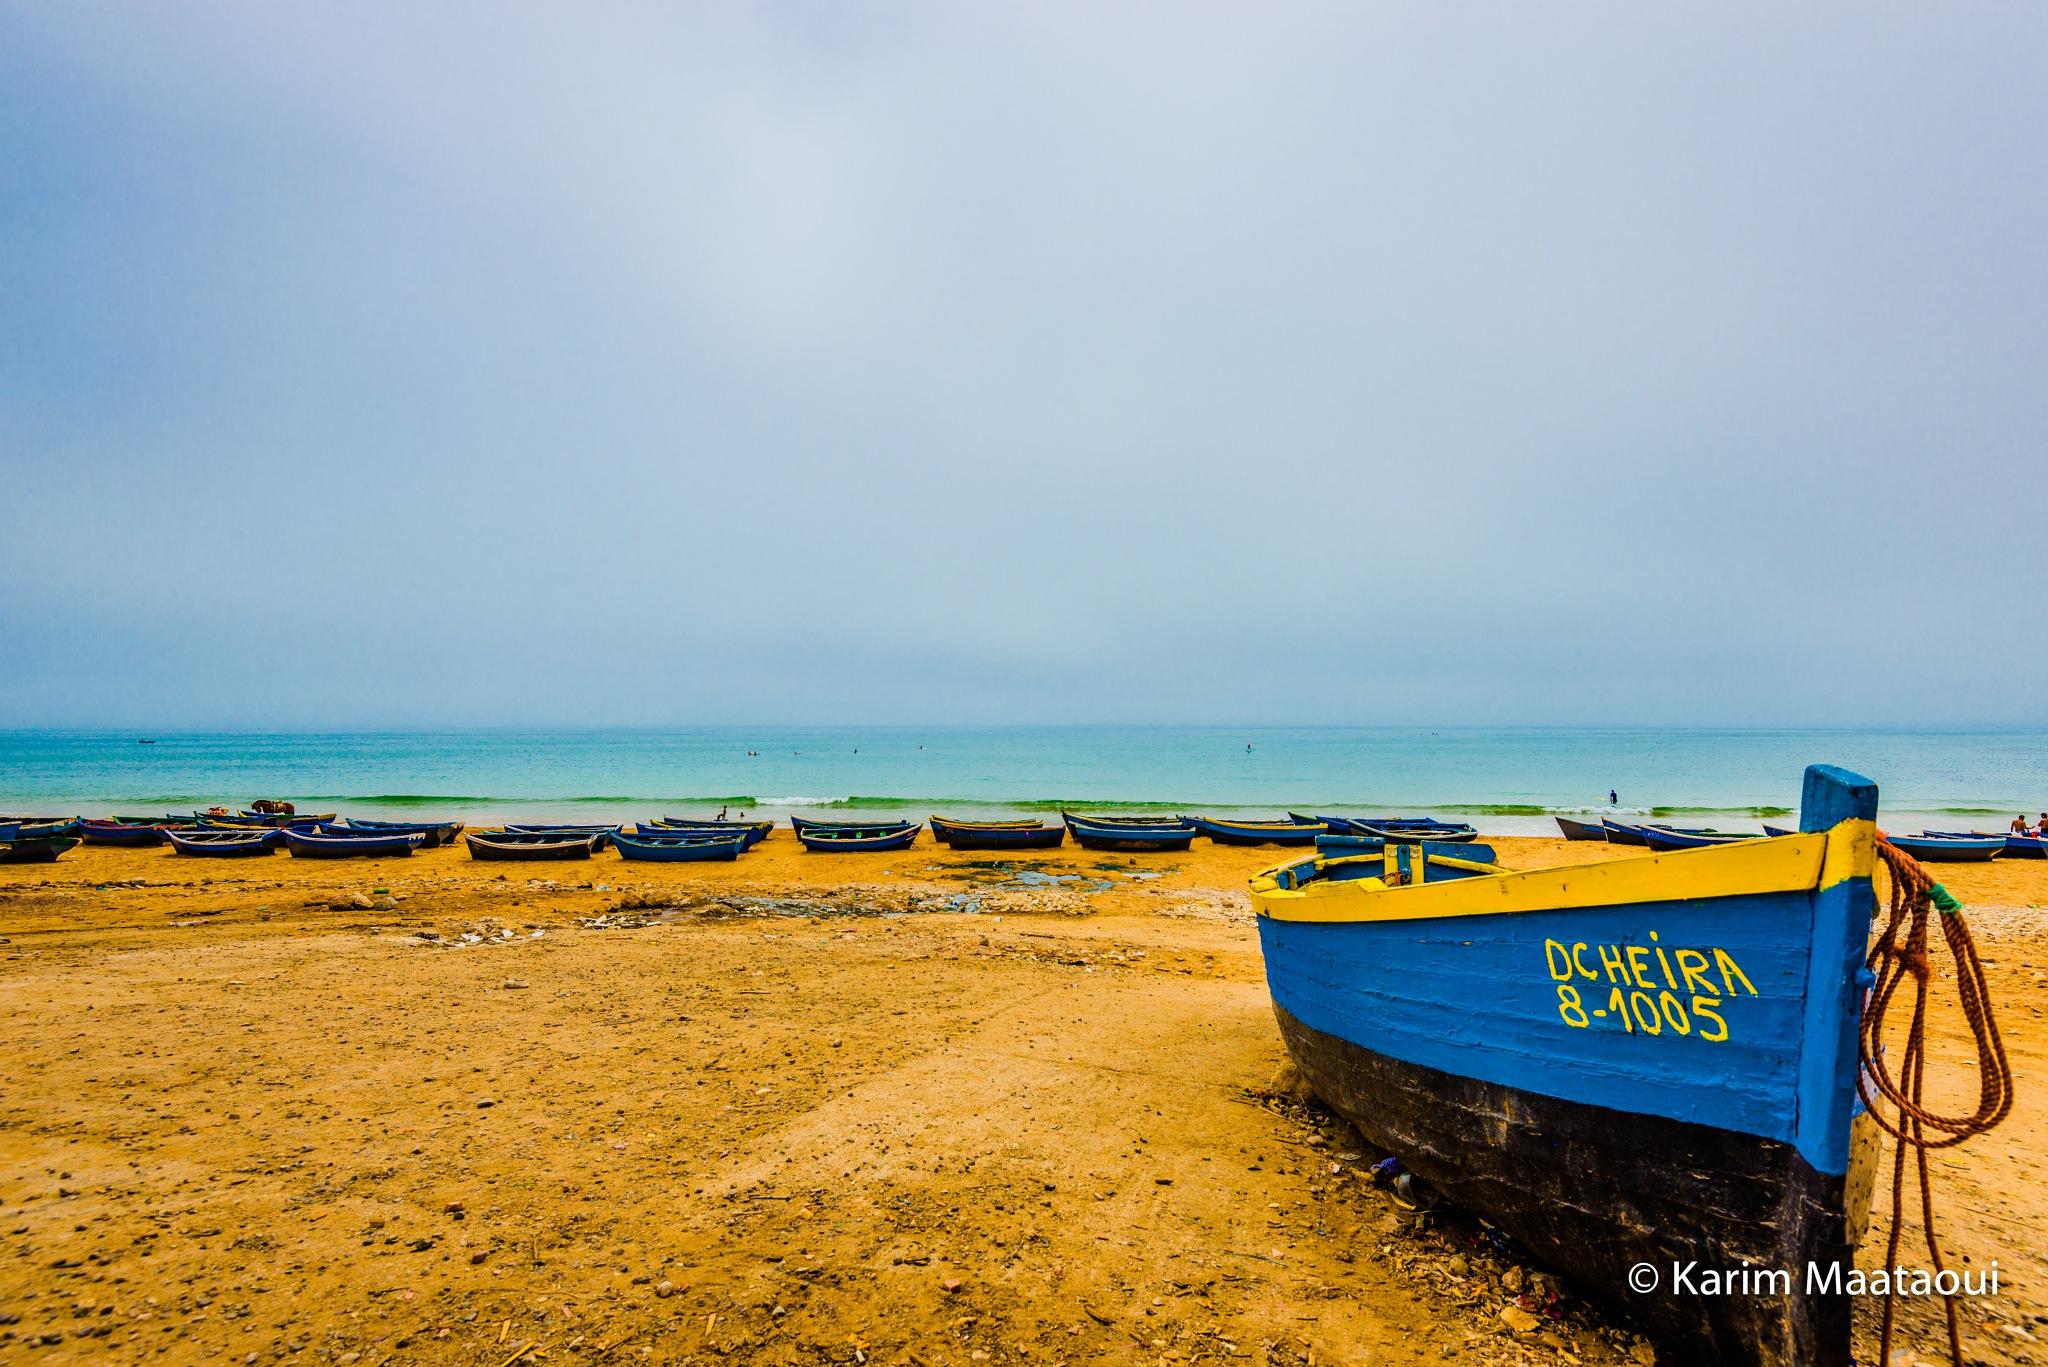 boat by KarimMaataoui